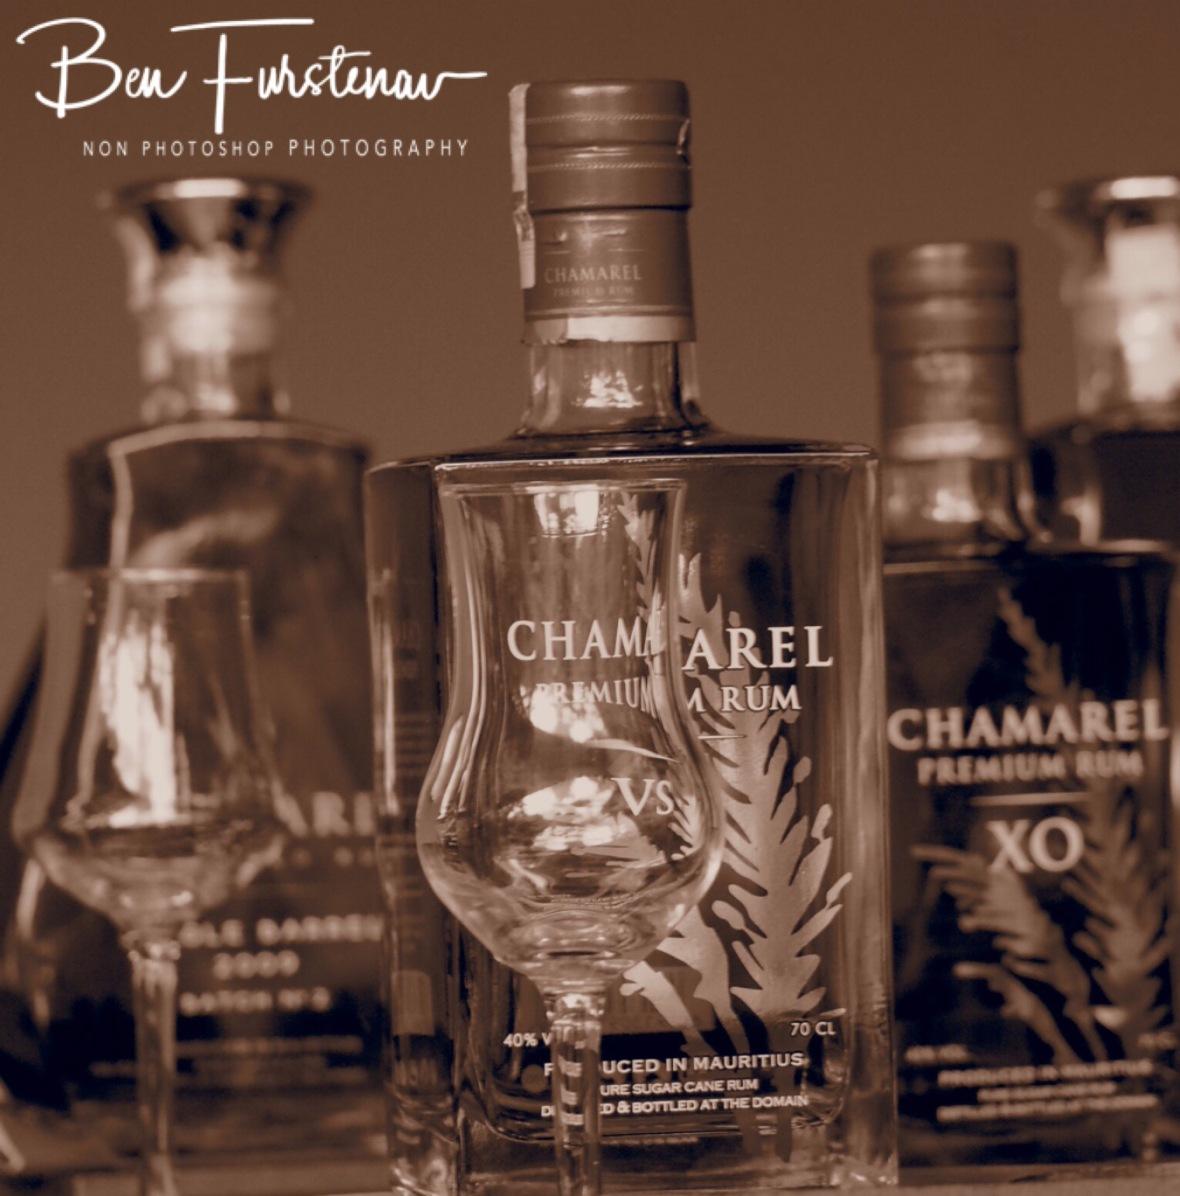 Classy but expensive rhum, Rhumerie de Charmarel.